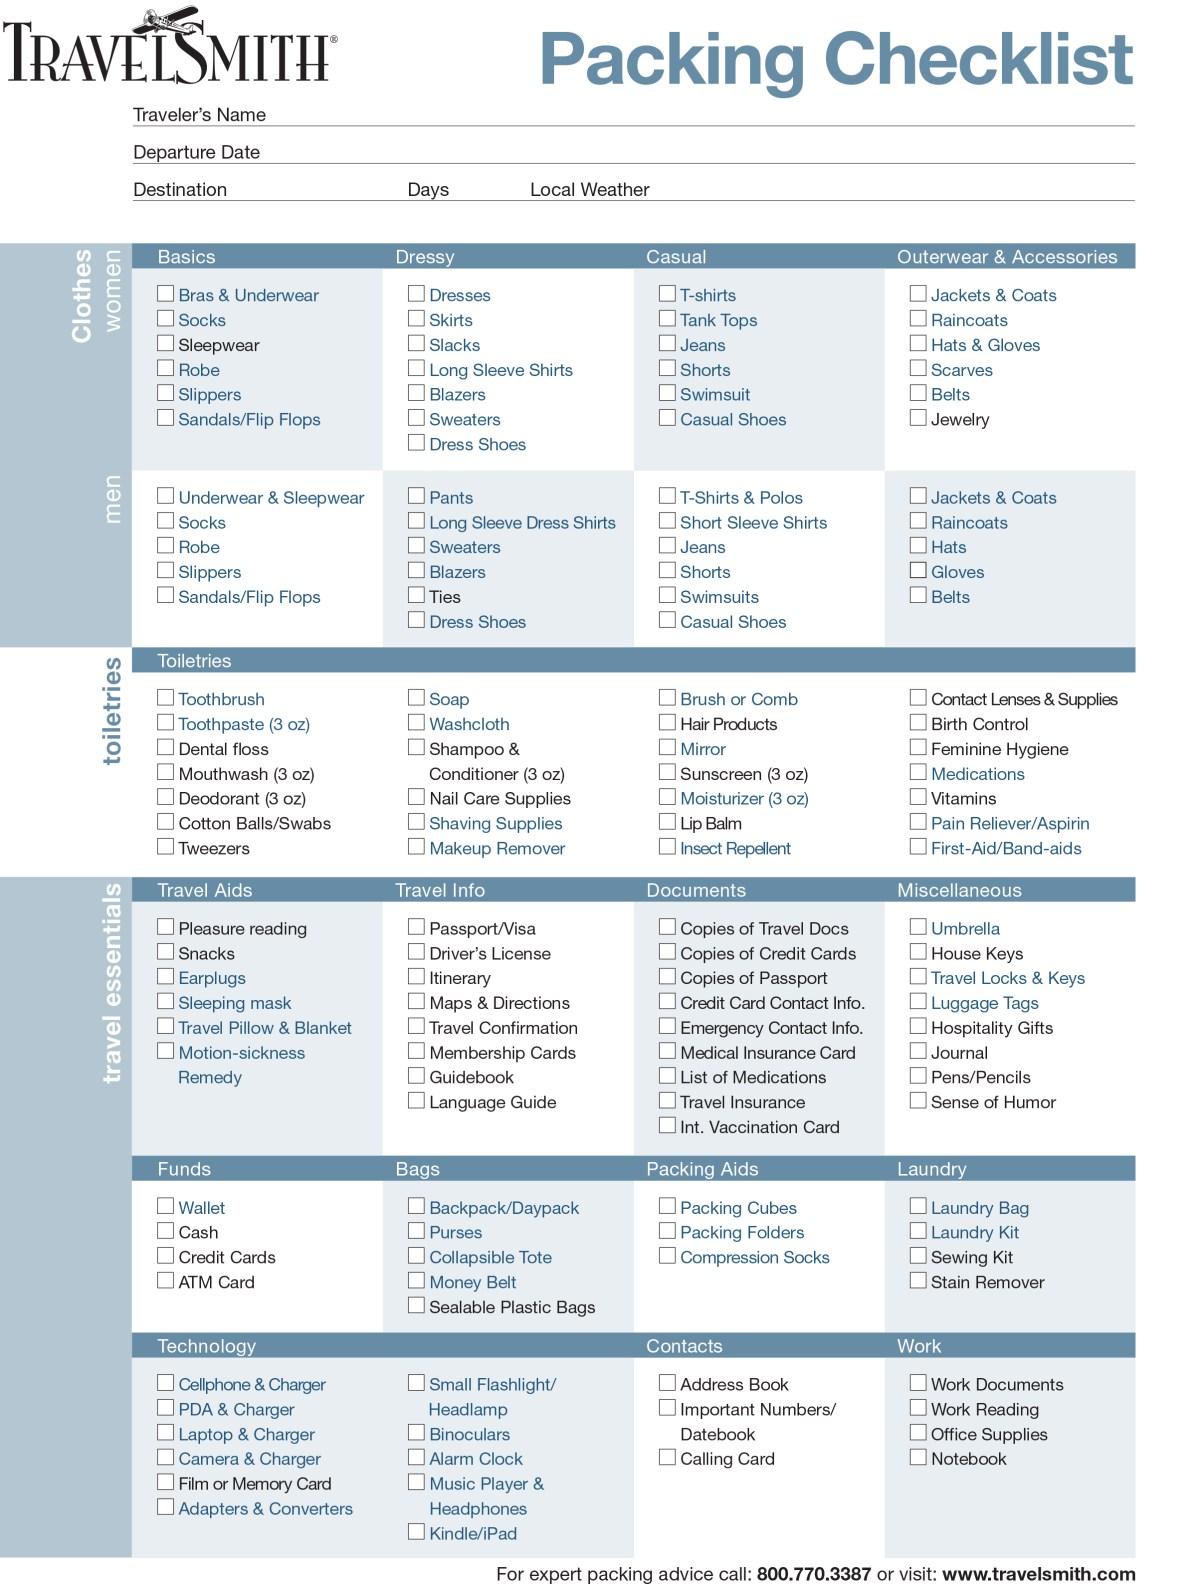 General Packing Checklist.jpg